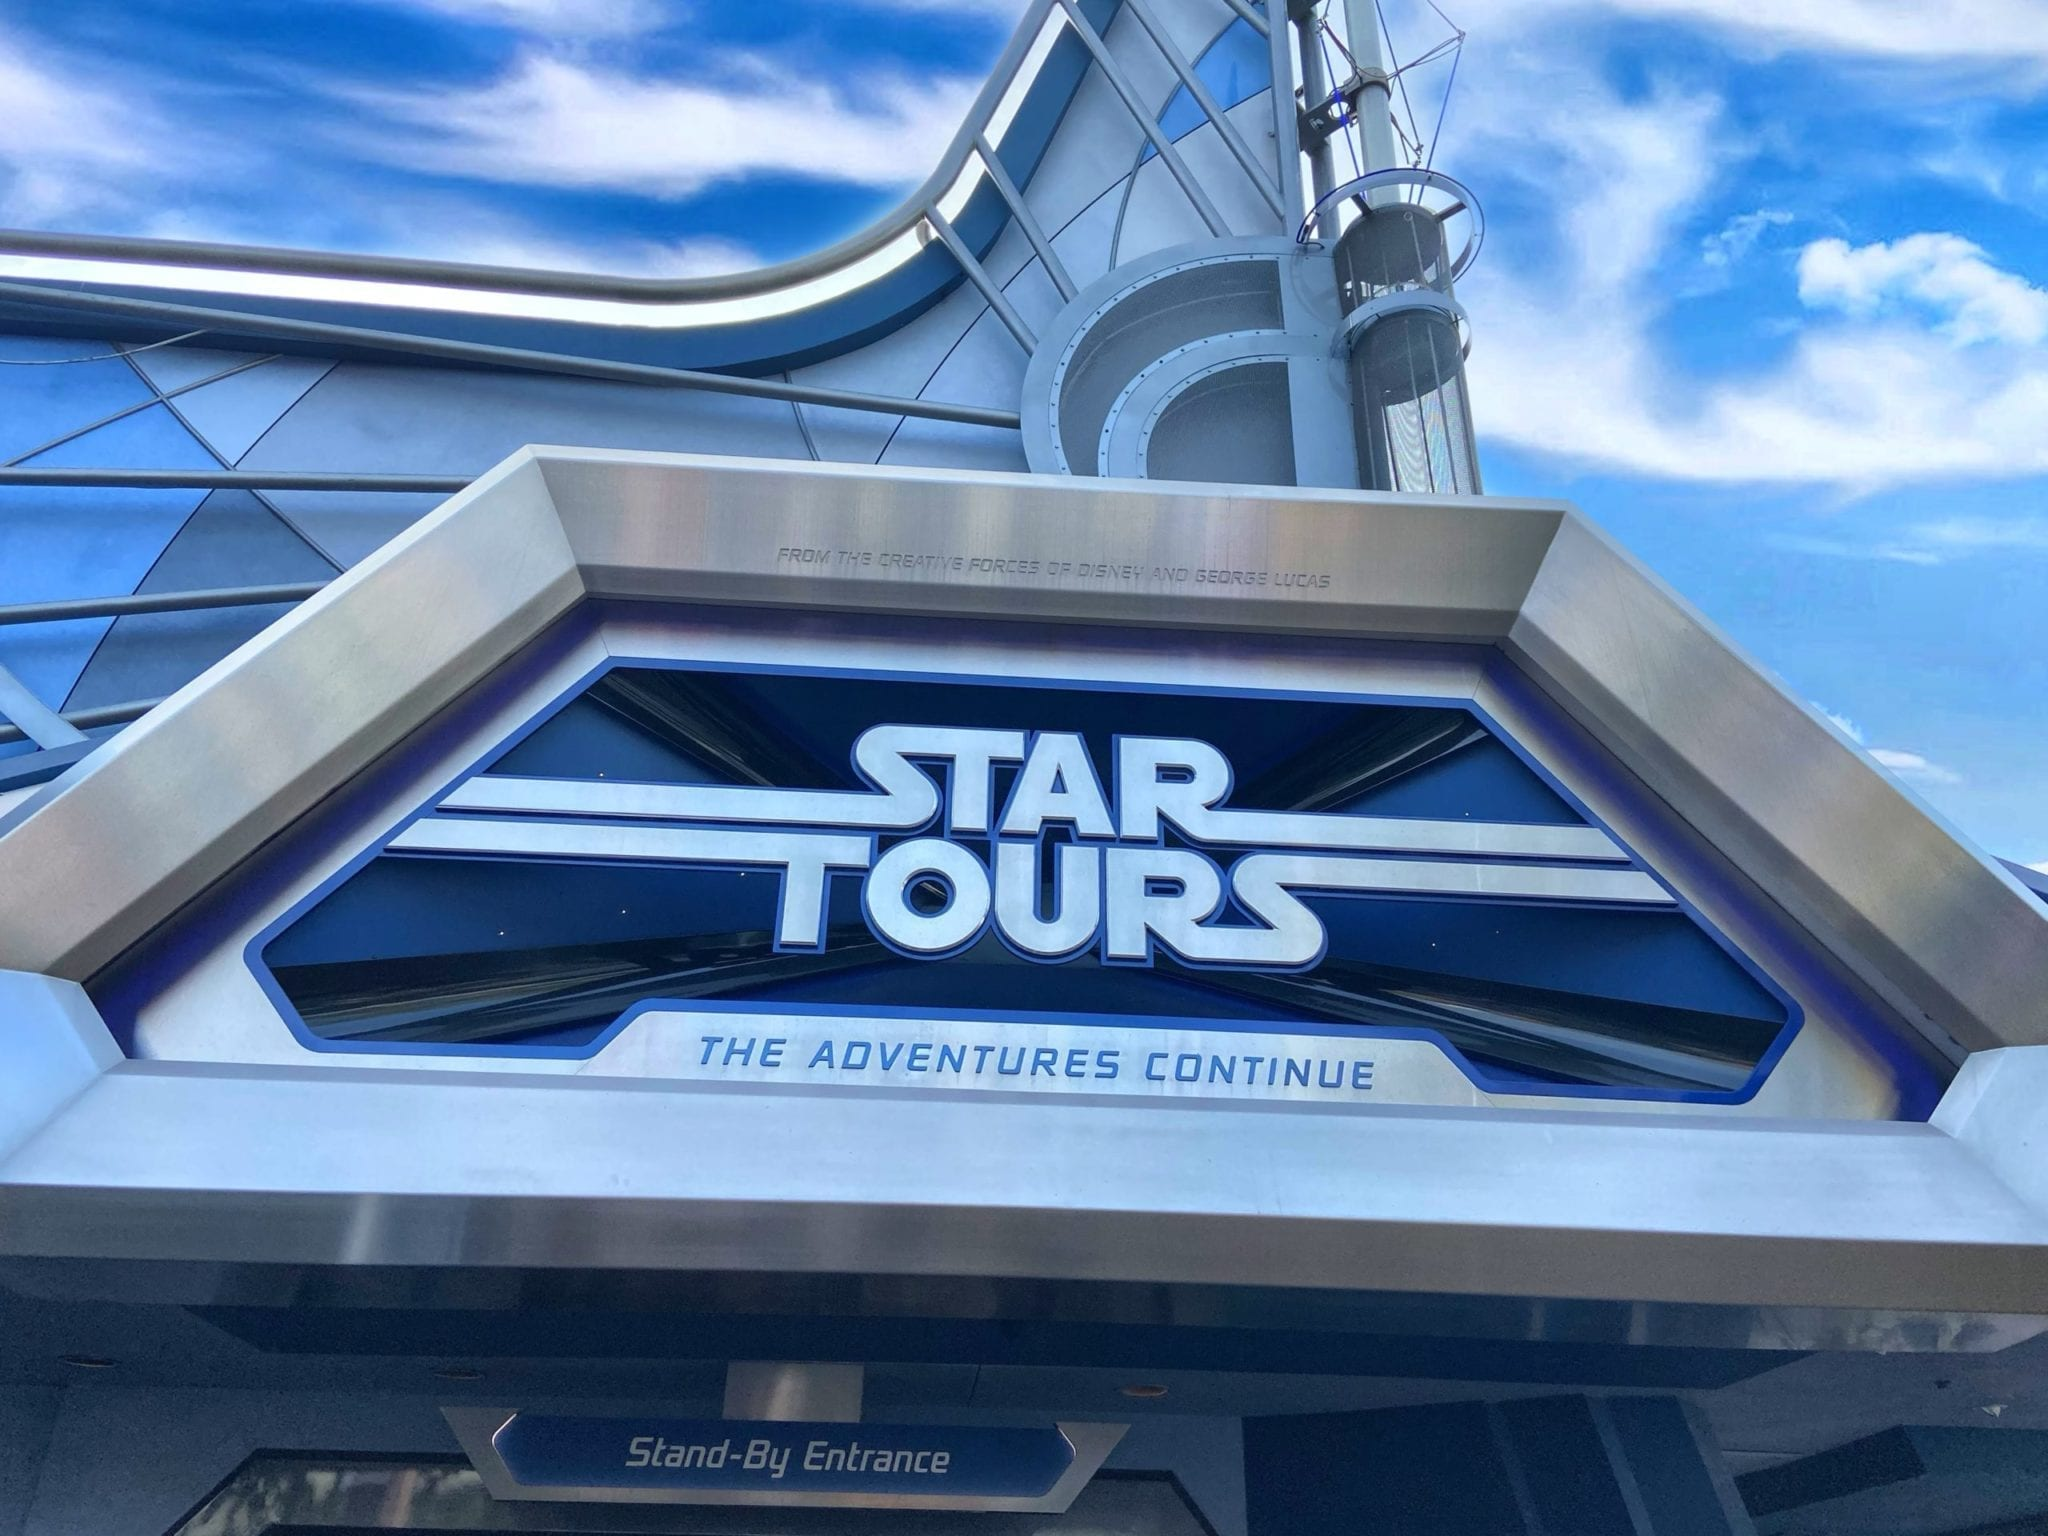 Star Tours adds Single Rider Line – Disneyland